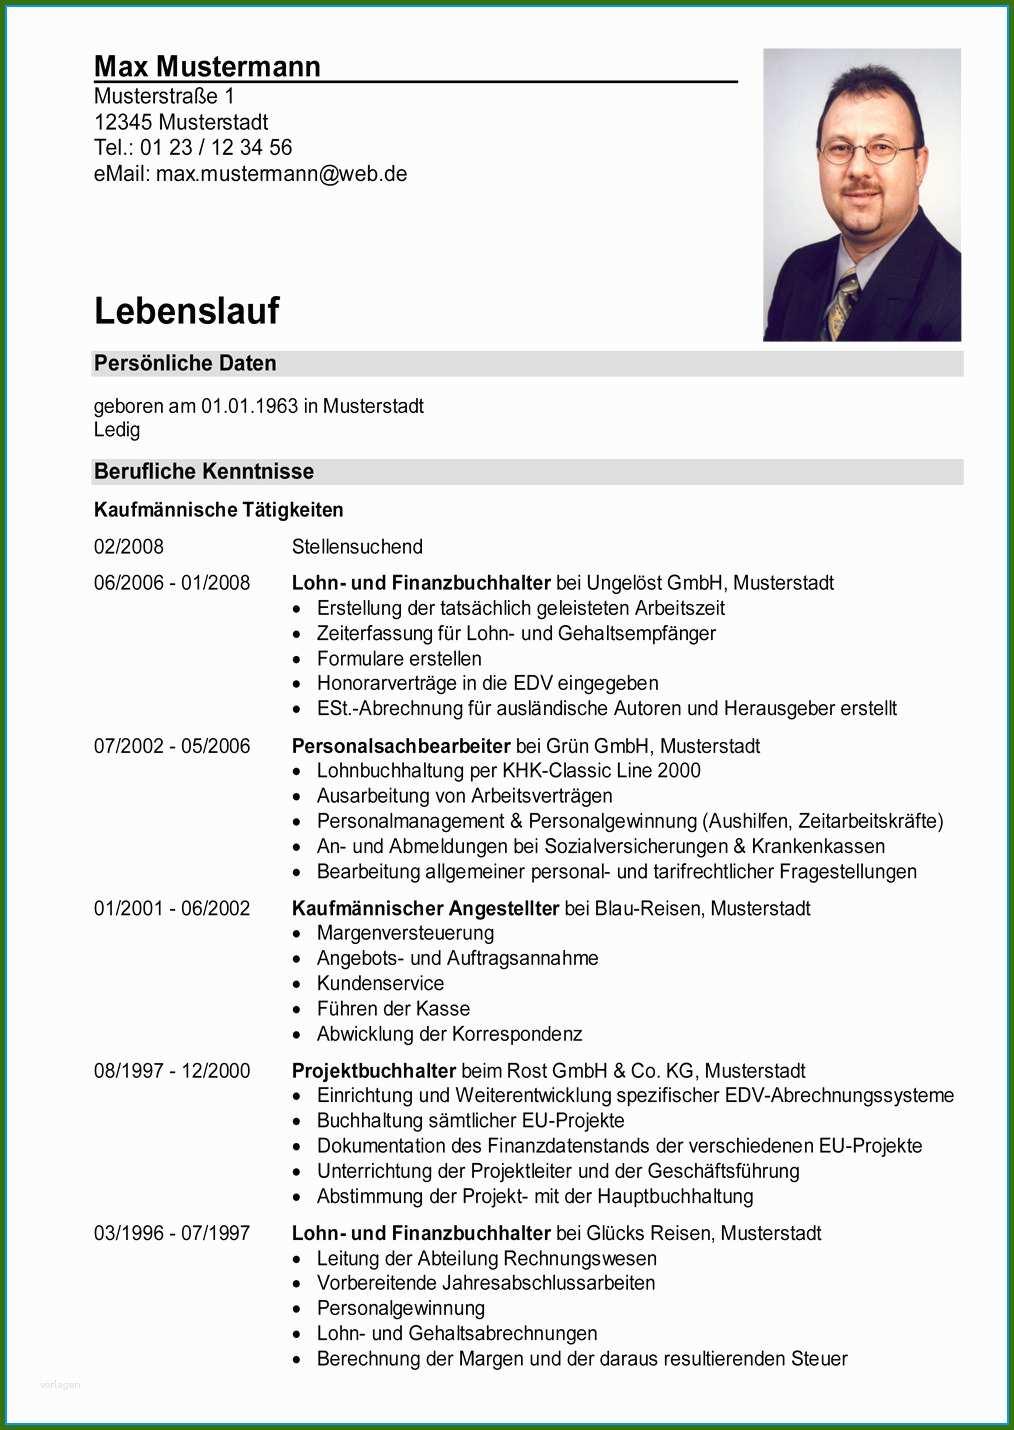 006 Kenntnisse Lebenslauf 20 Edv Kenntnisse Lebenslauf ...